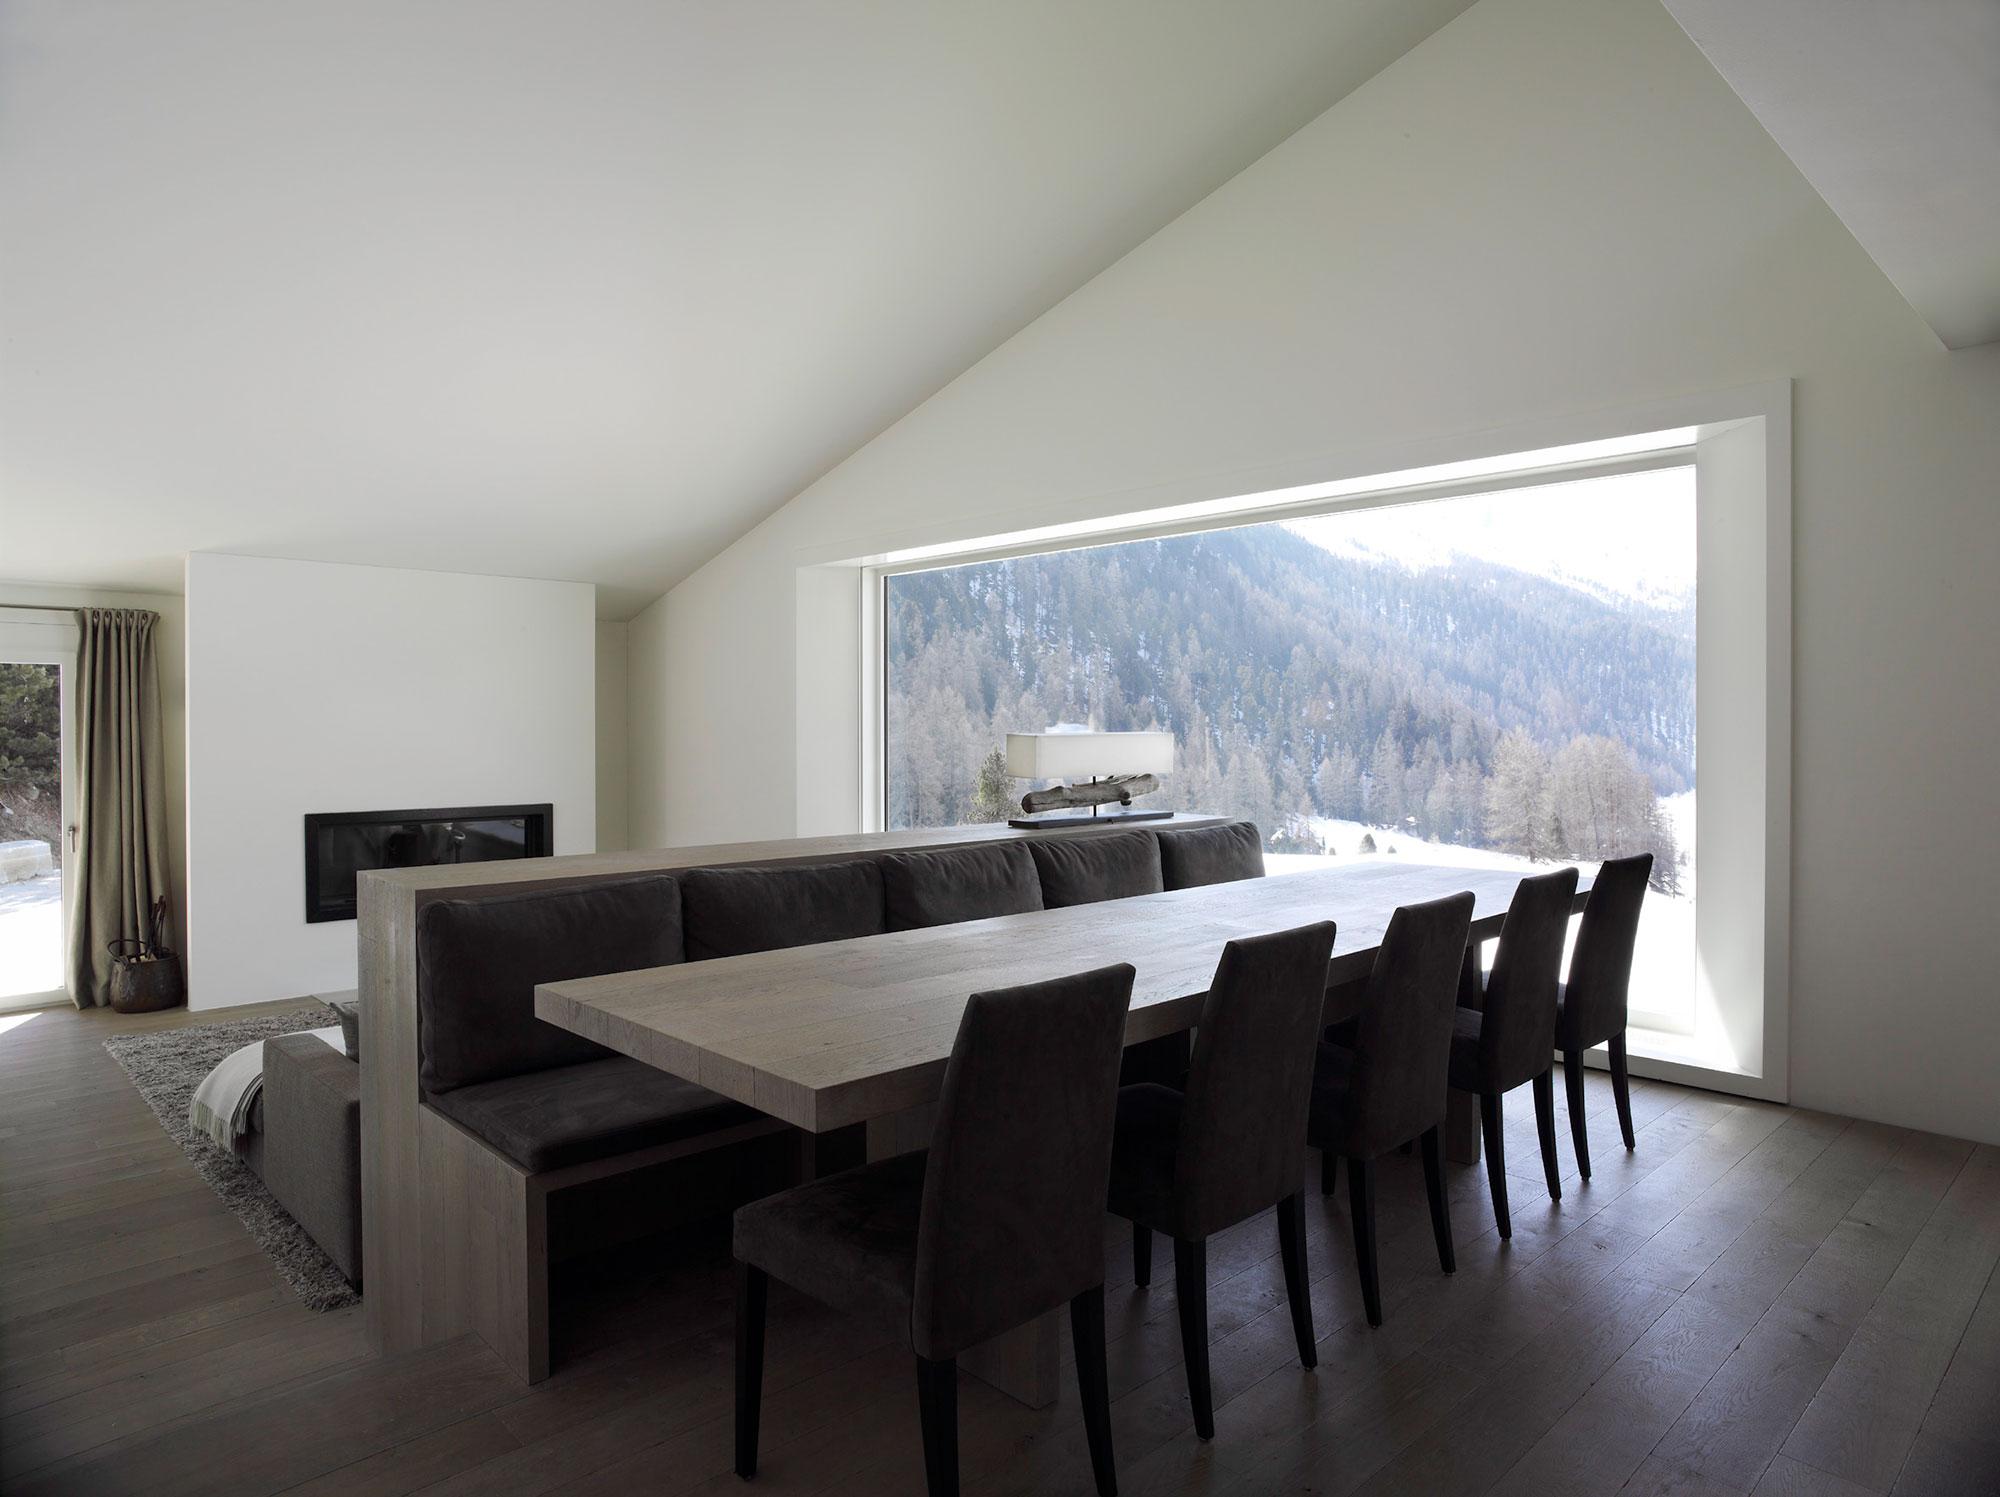 031_iria_degen_interiors_apartment_house_engadin2v2.jpg